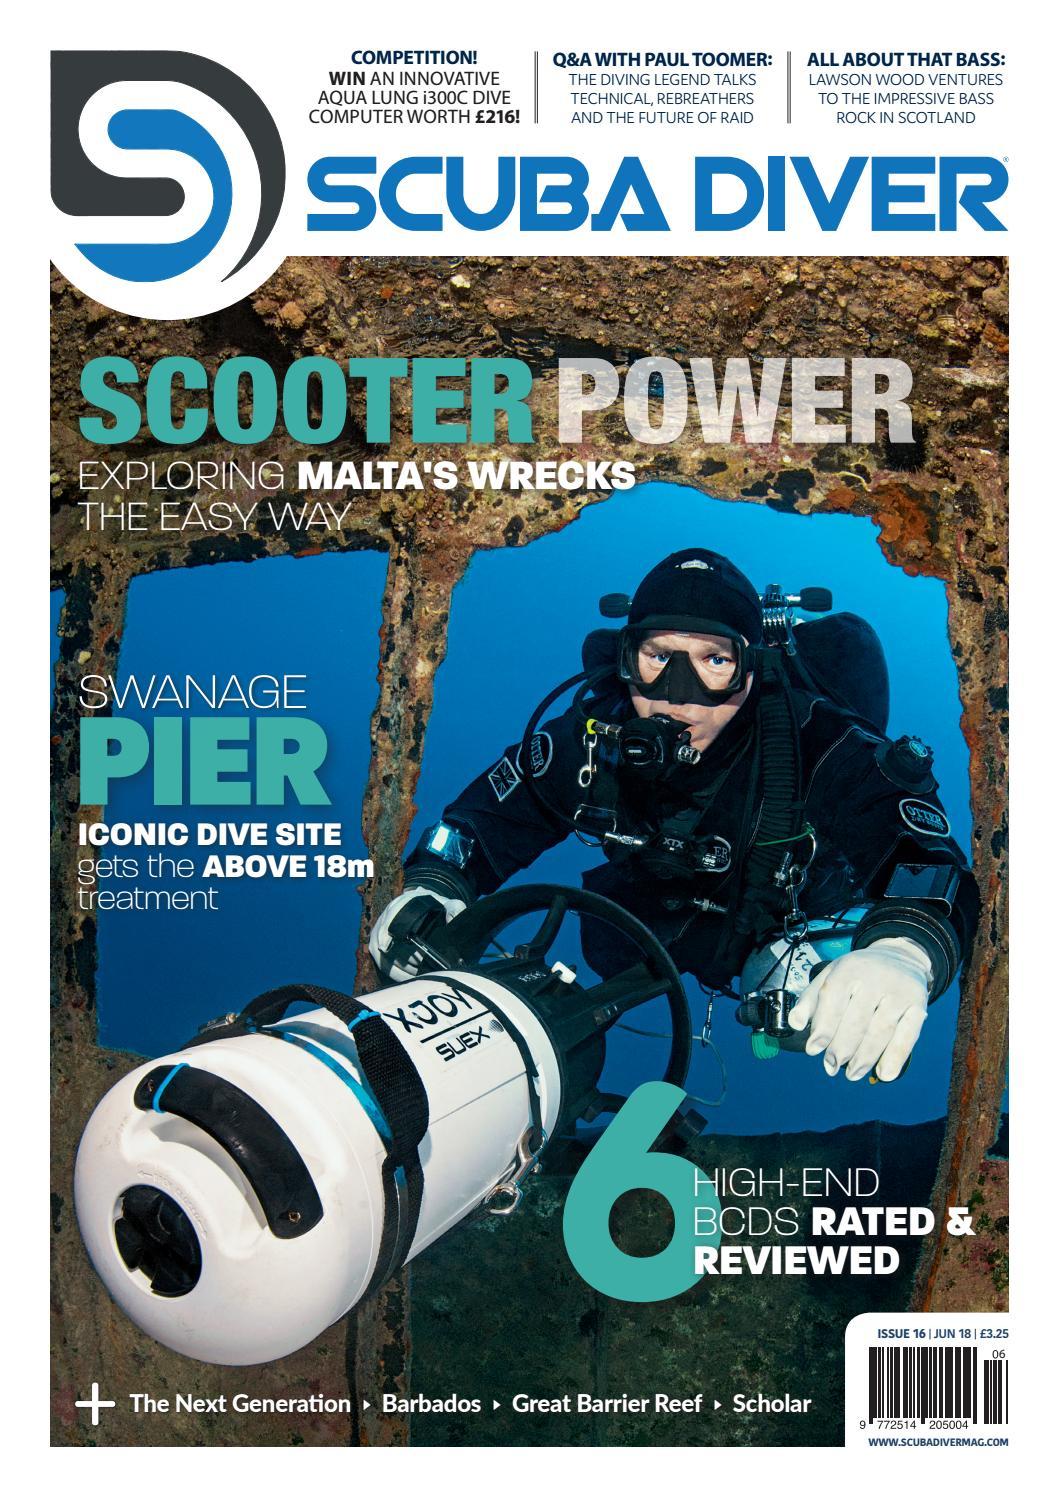 Scuba Issuu June By Uk Scubadivermag Diver Issue 18 16 rdtQhsC